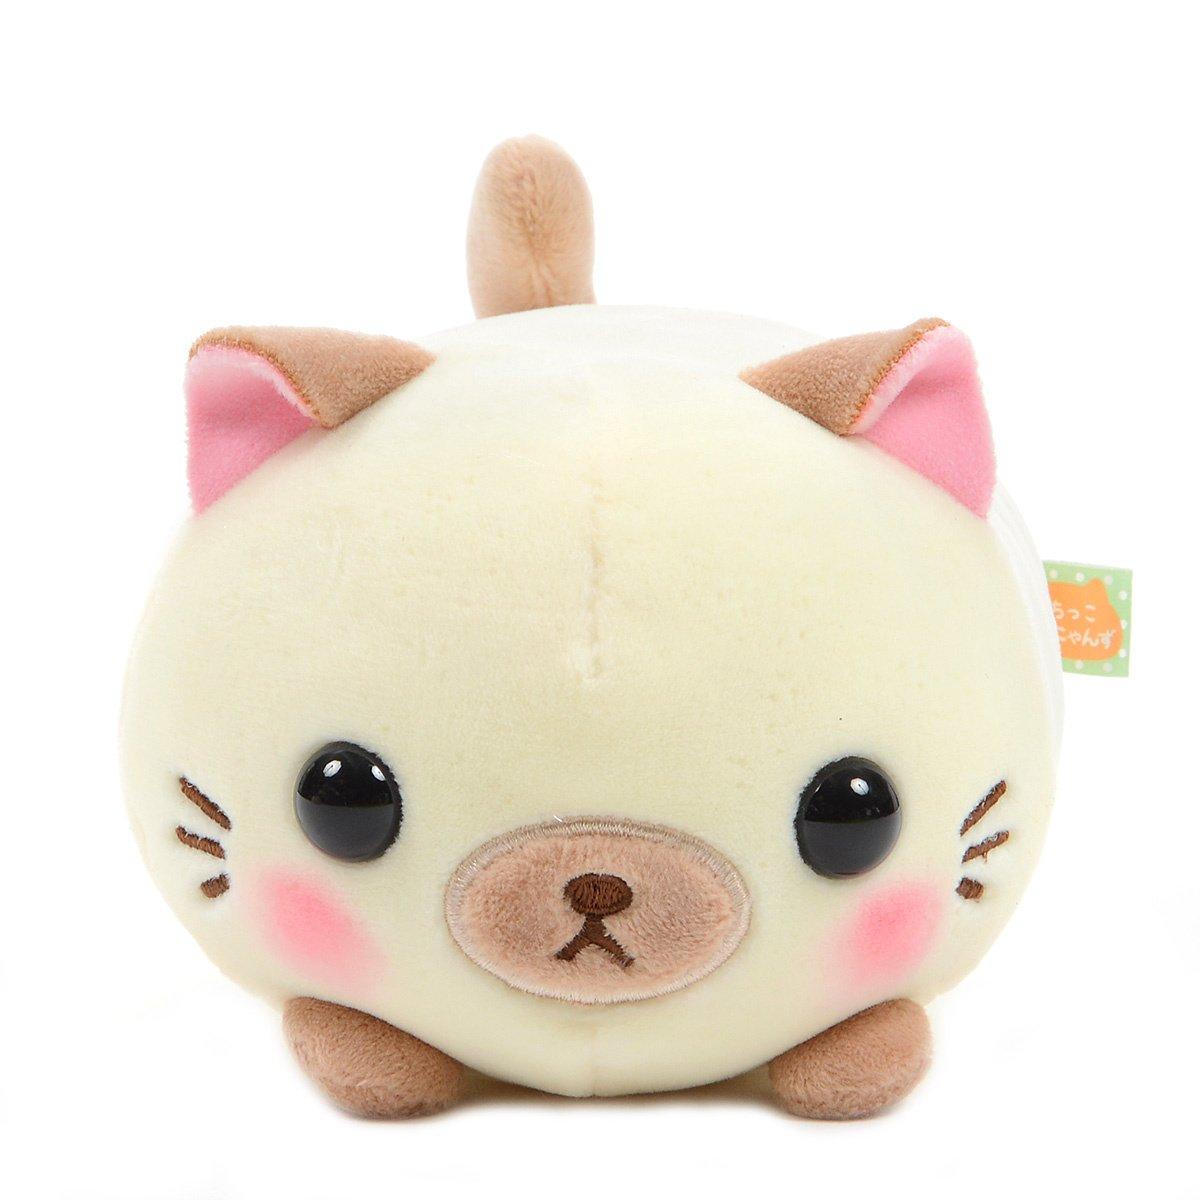 Mochikko Neko Nyanzu Beige Cat Plush Amuse Super Soft Japan Standard Size Shamu-nyan